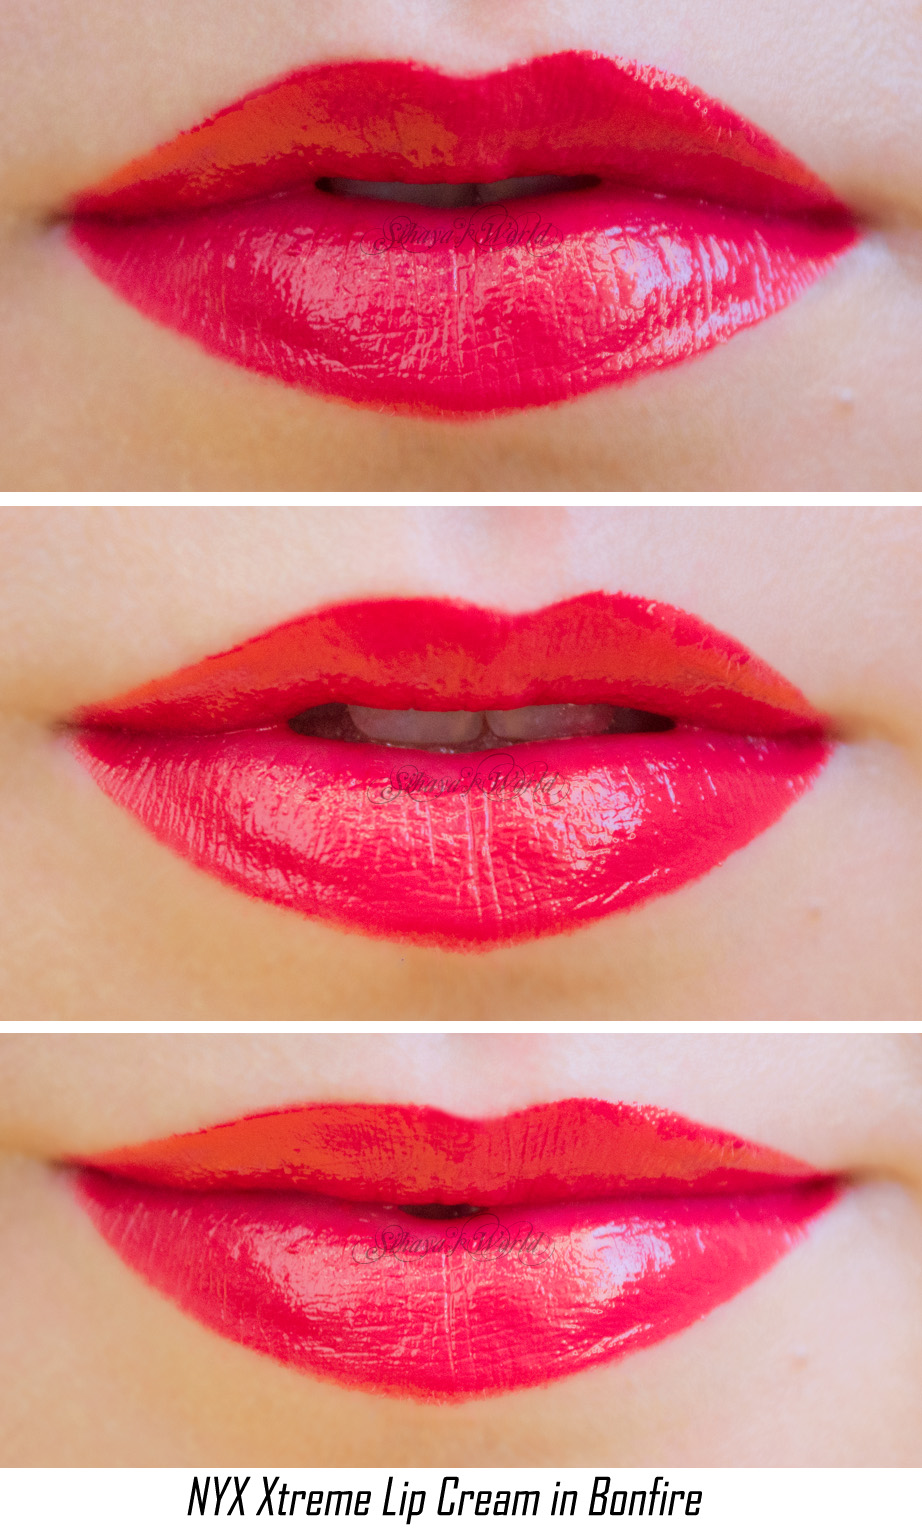 NYX ♥ Xtreme Lip Cream Bonfire